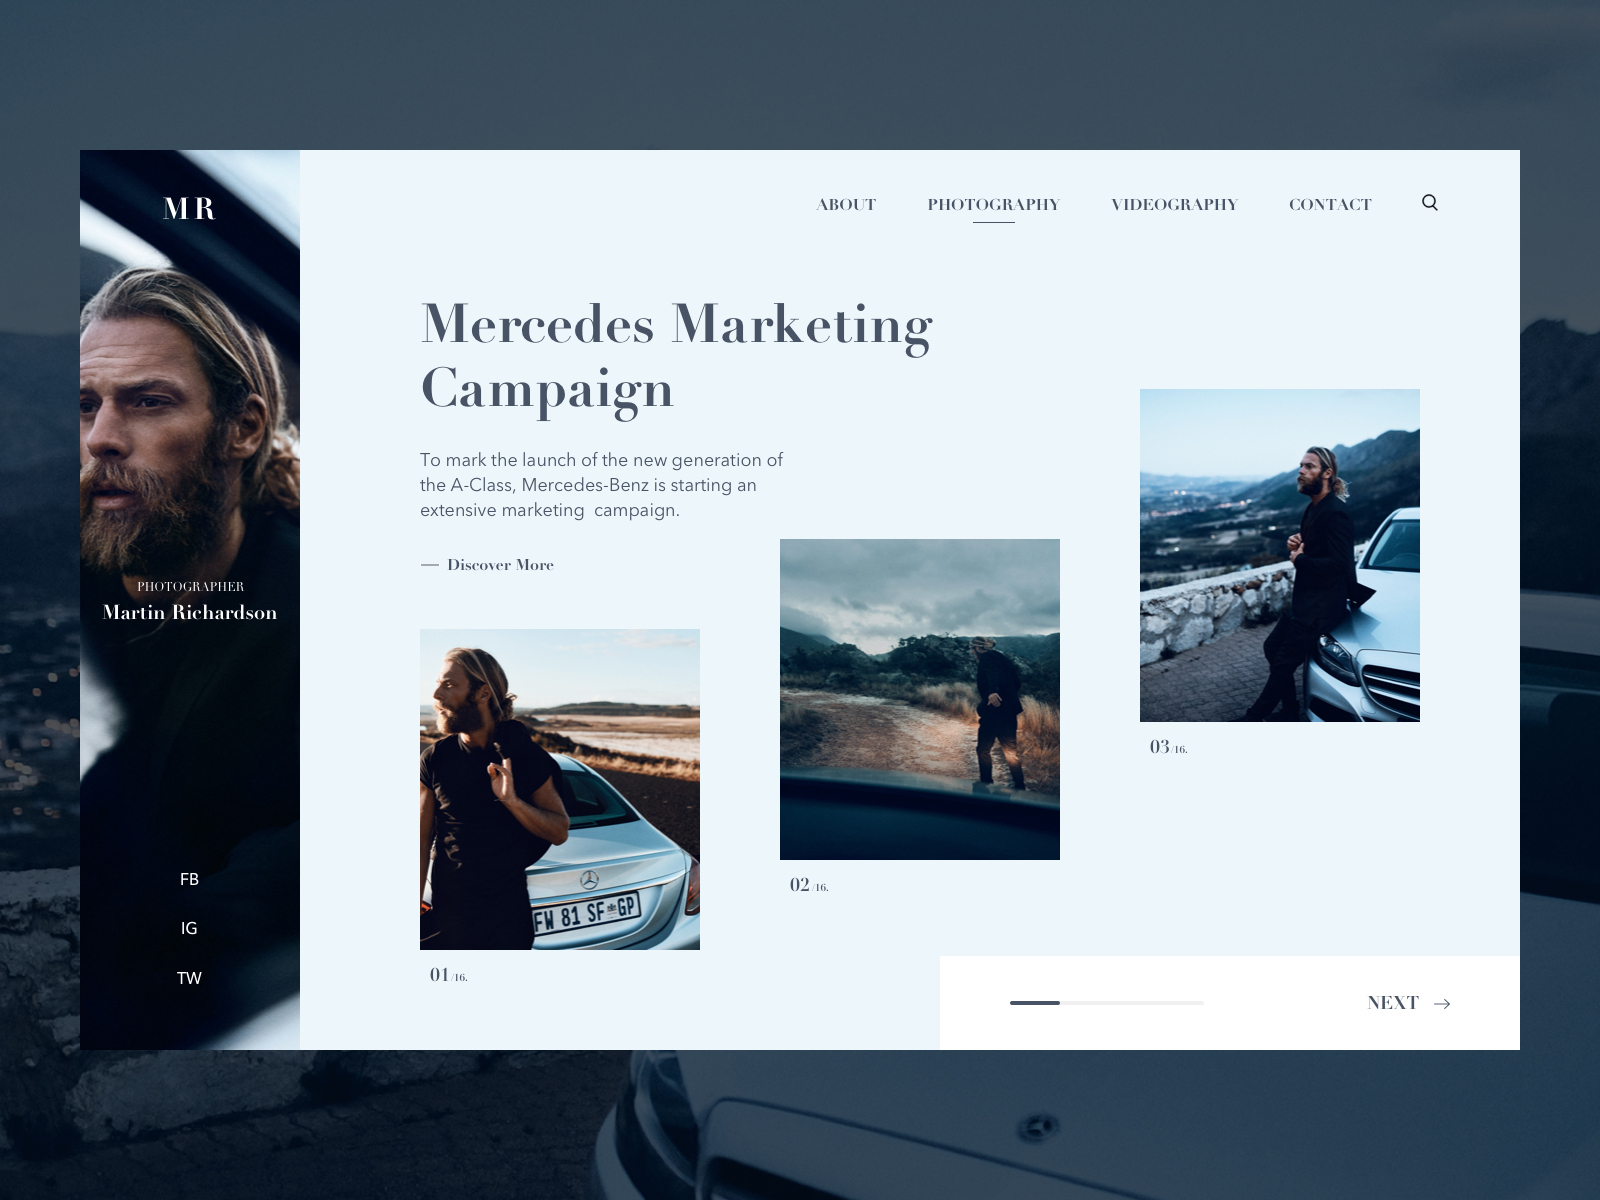 Mercedes Marketing Campaign Concept by Anastasia Eletskaya